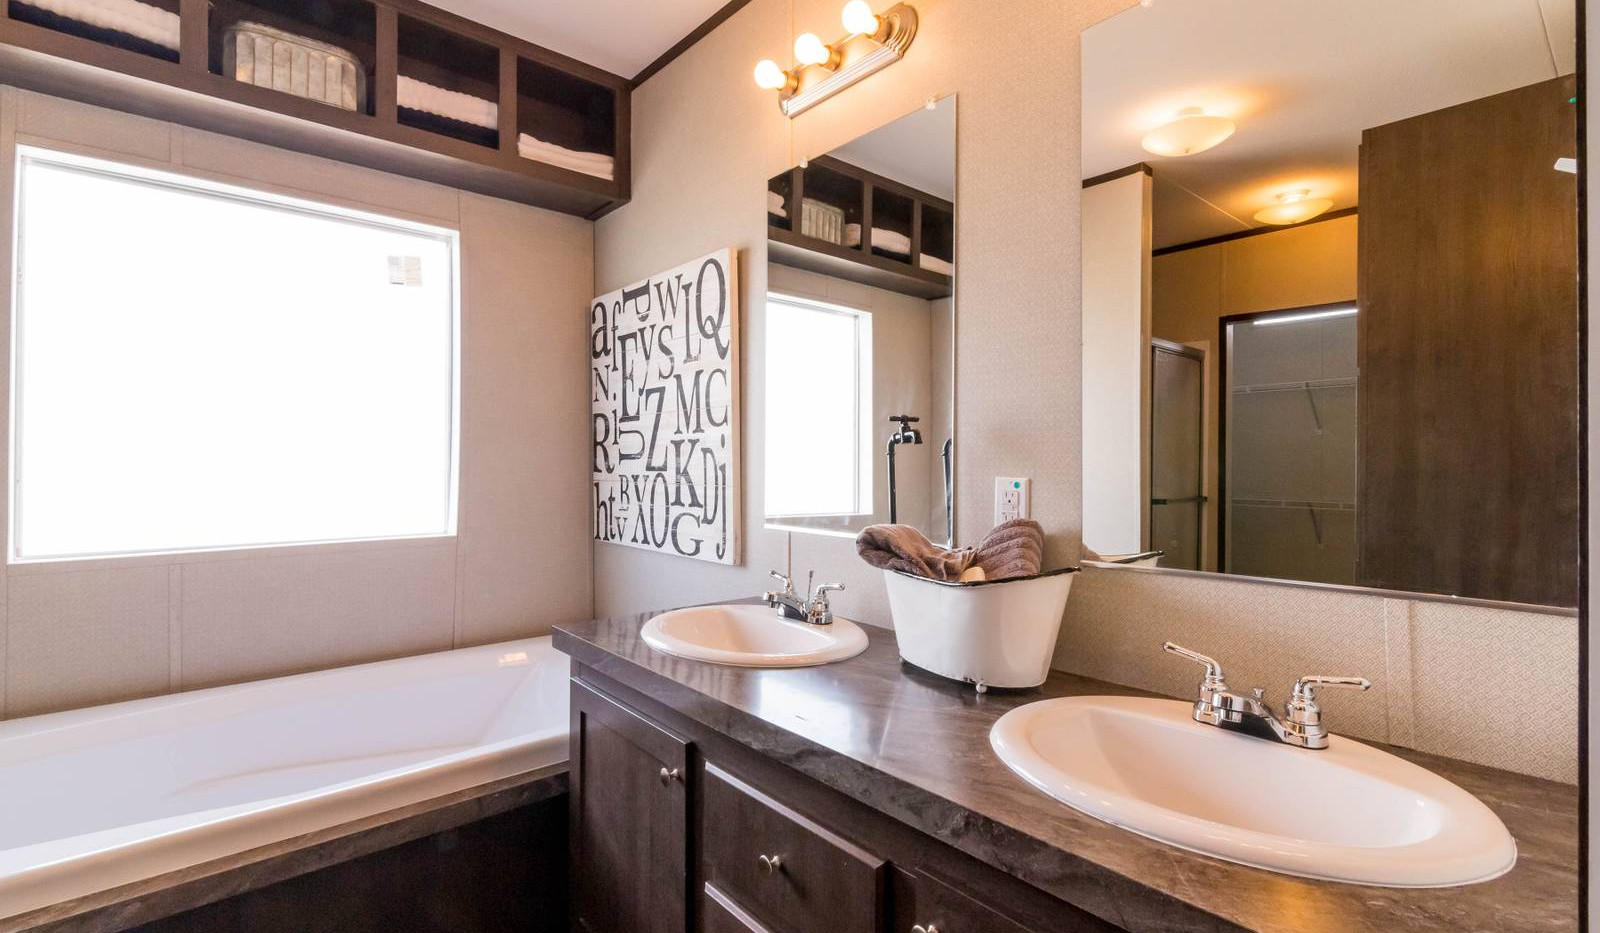 14-1676H bathroom 1-1600x1067.jpg